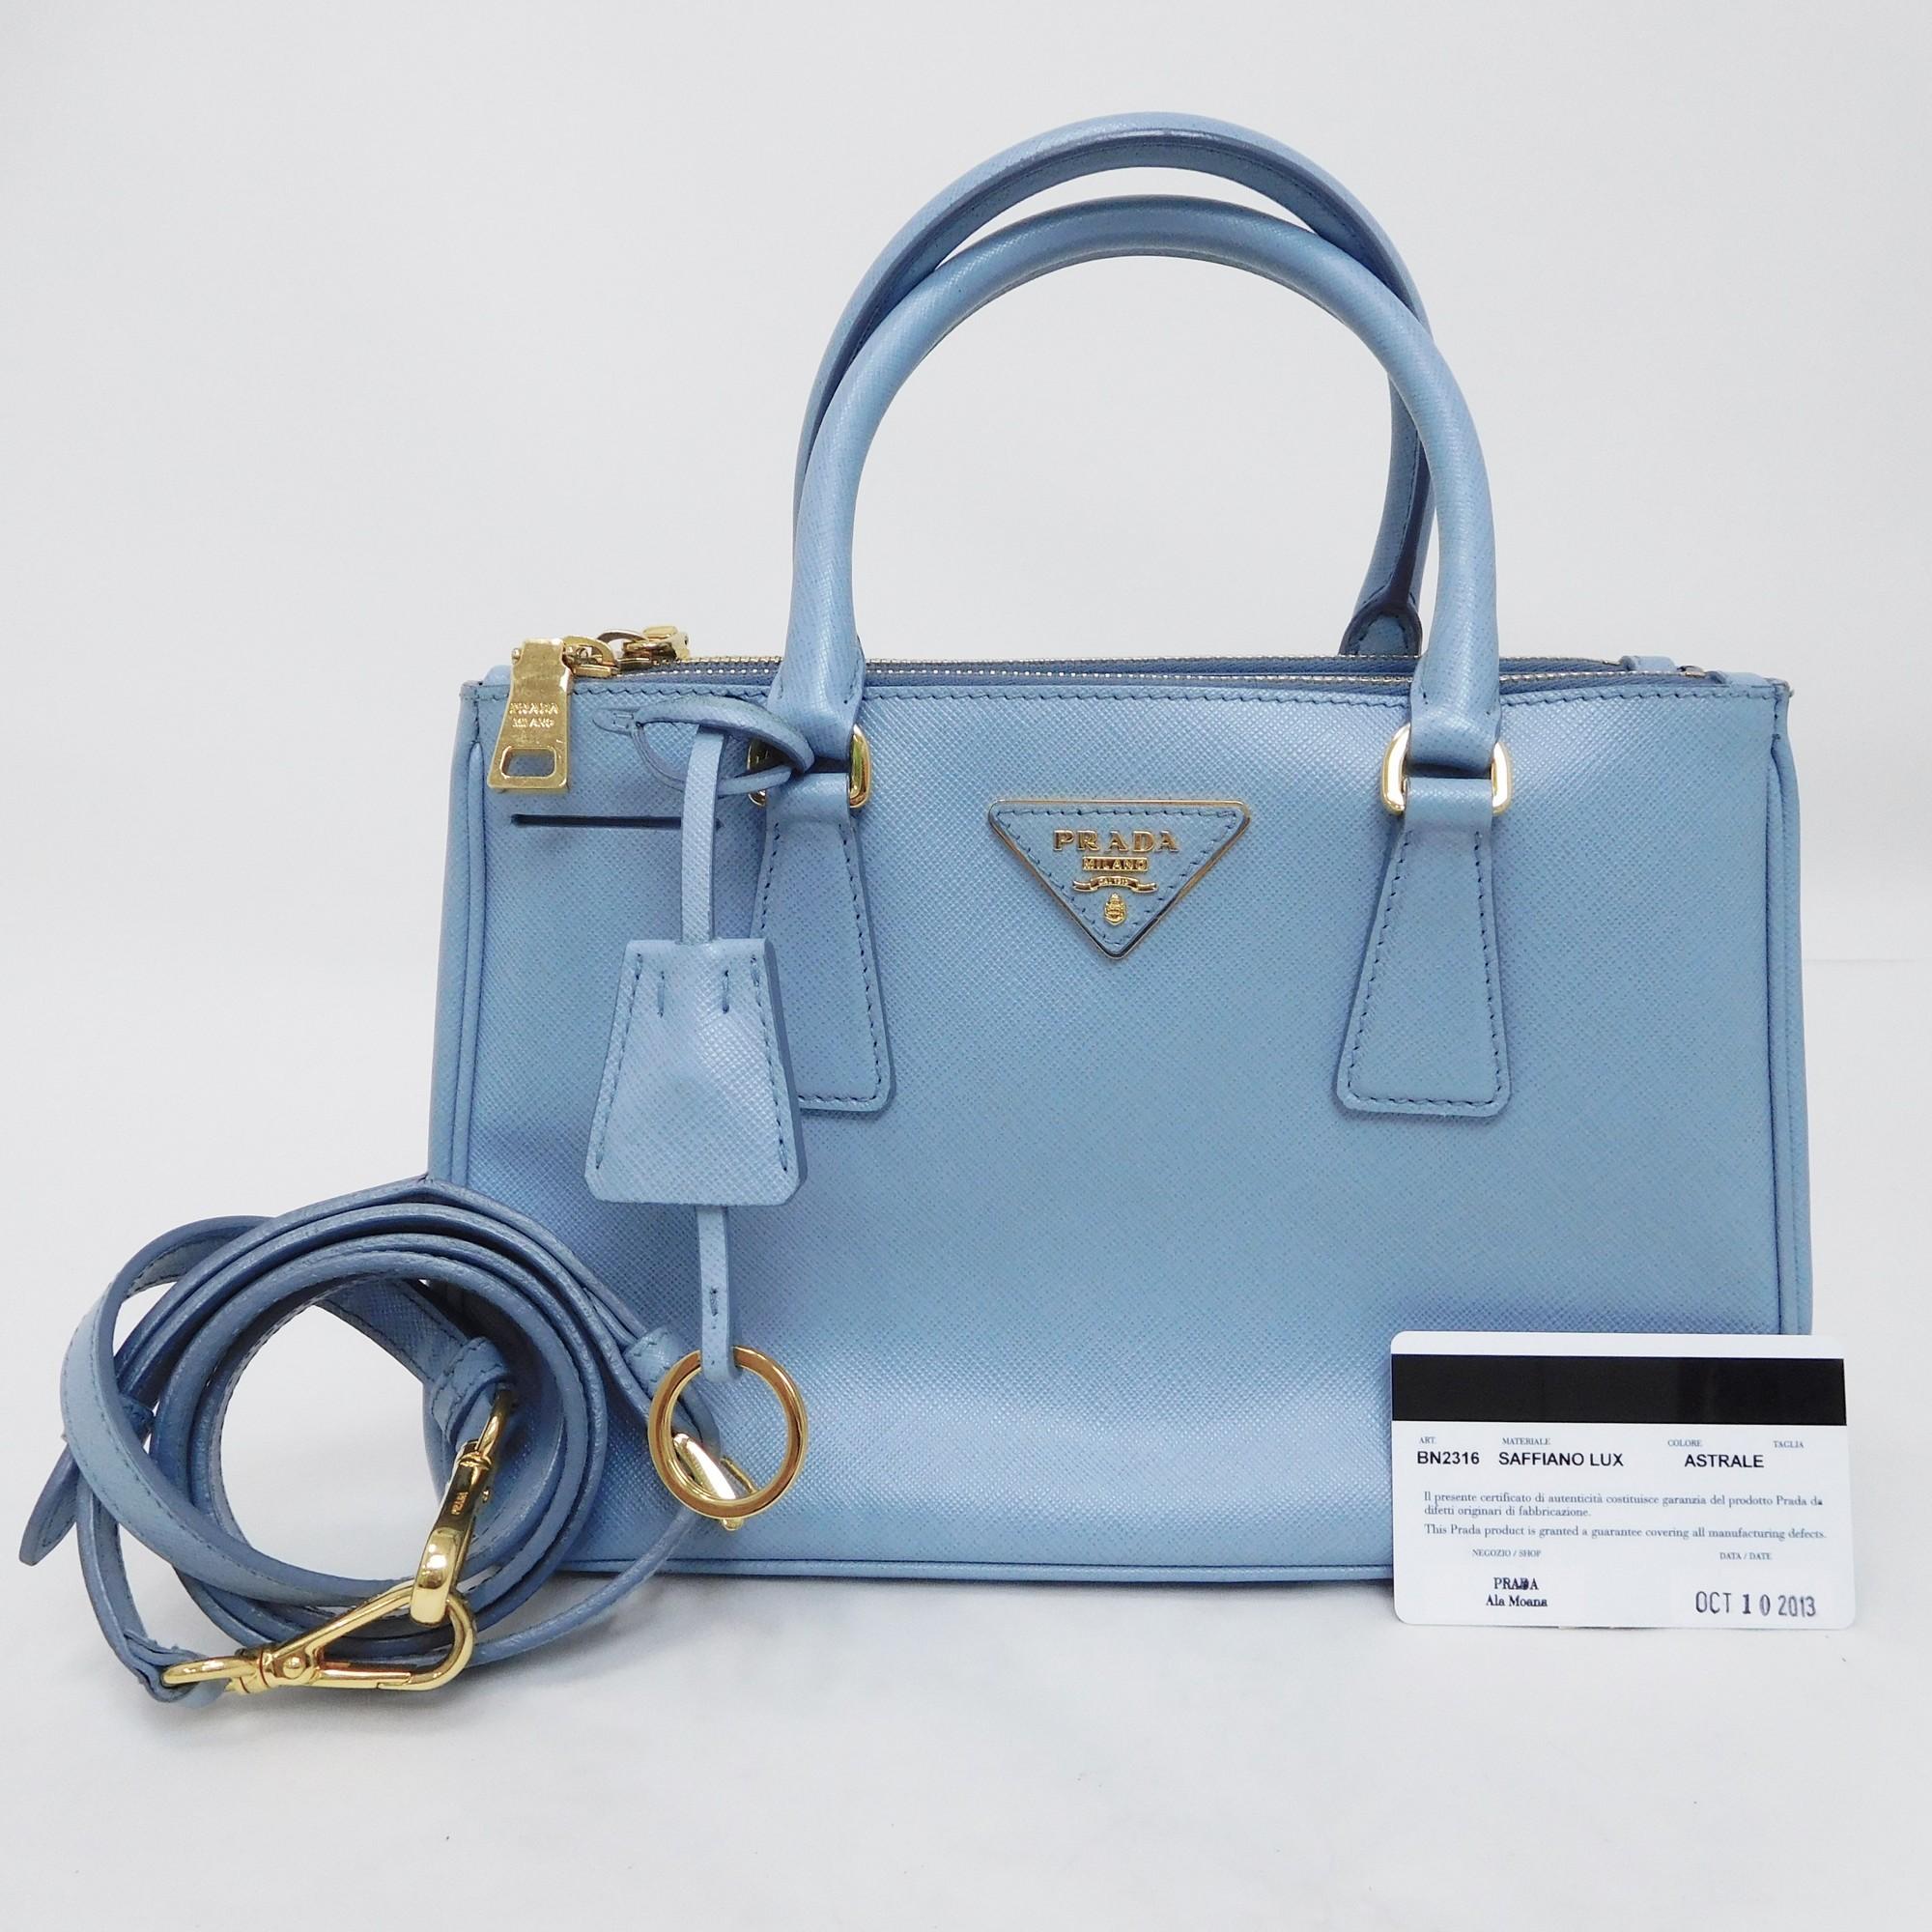 978eb75c5d5 Auth Prada Saffiano BN 2316 SAFFIANO LUX 2 Way GALLERIA Leather Shoulder  Bag   H